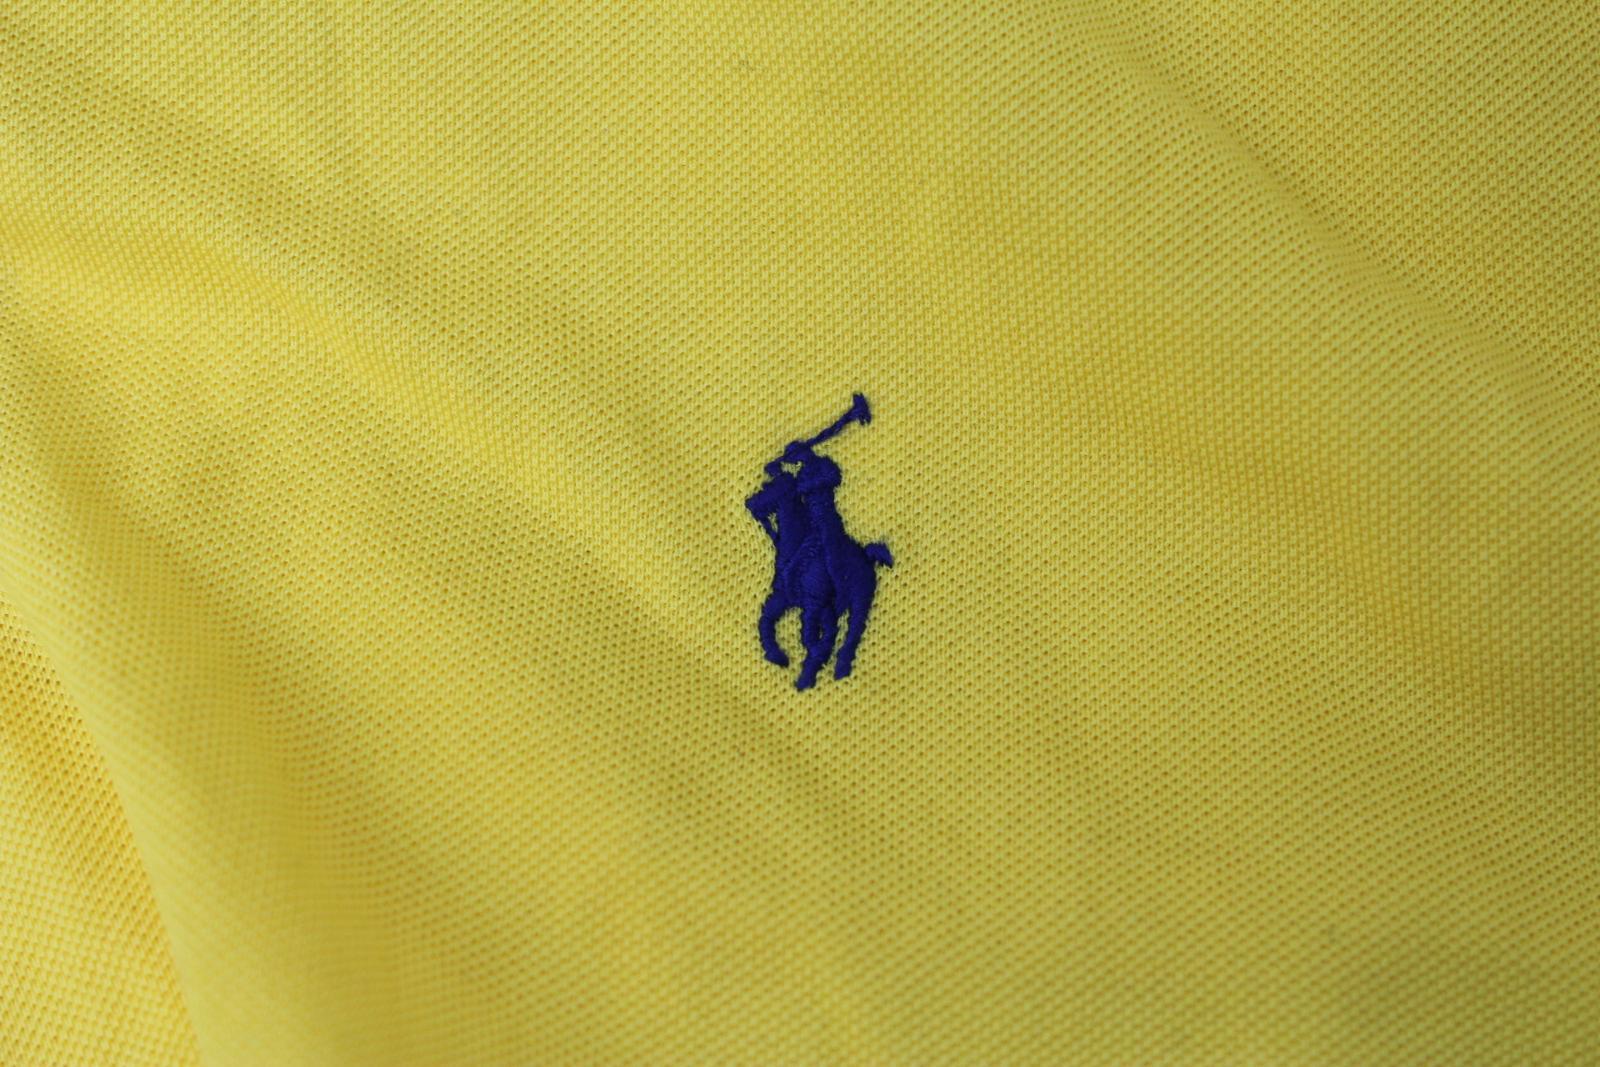 Ralph-Lauren-Polo-para-hombre-de-Amarillo-De-Algodon-Manga-Corta-Camisa-Polo-De-Ajuste-Personalizado miniatura 7